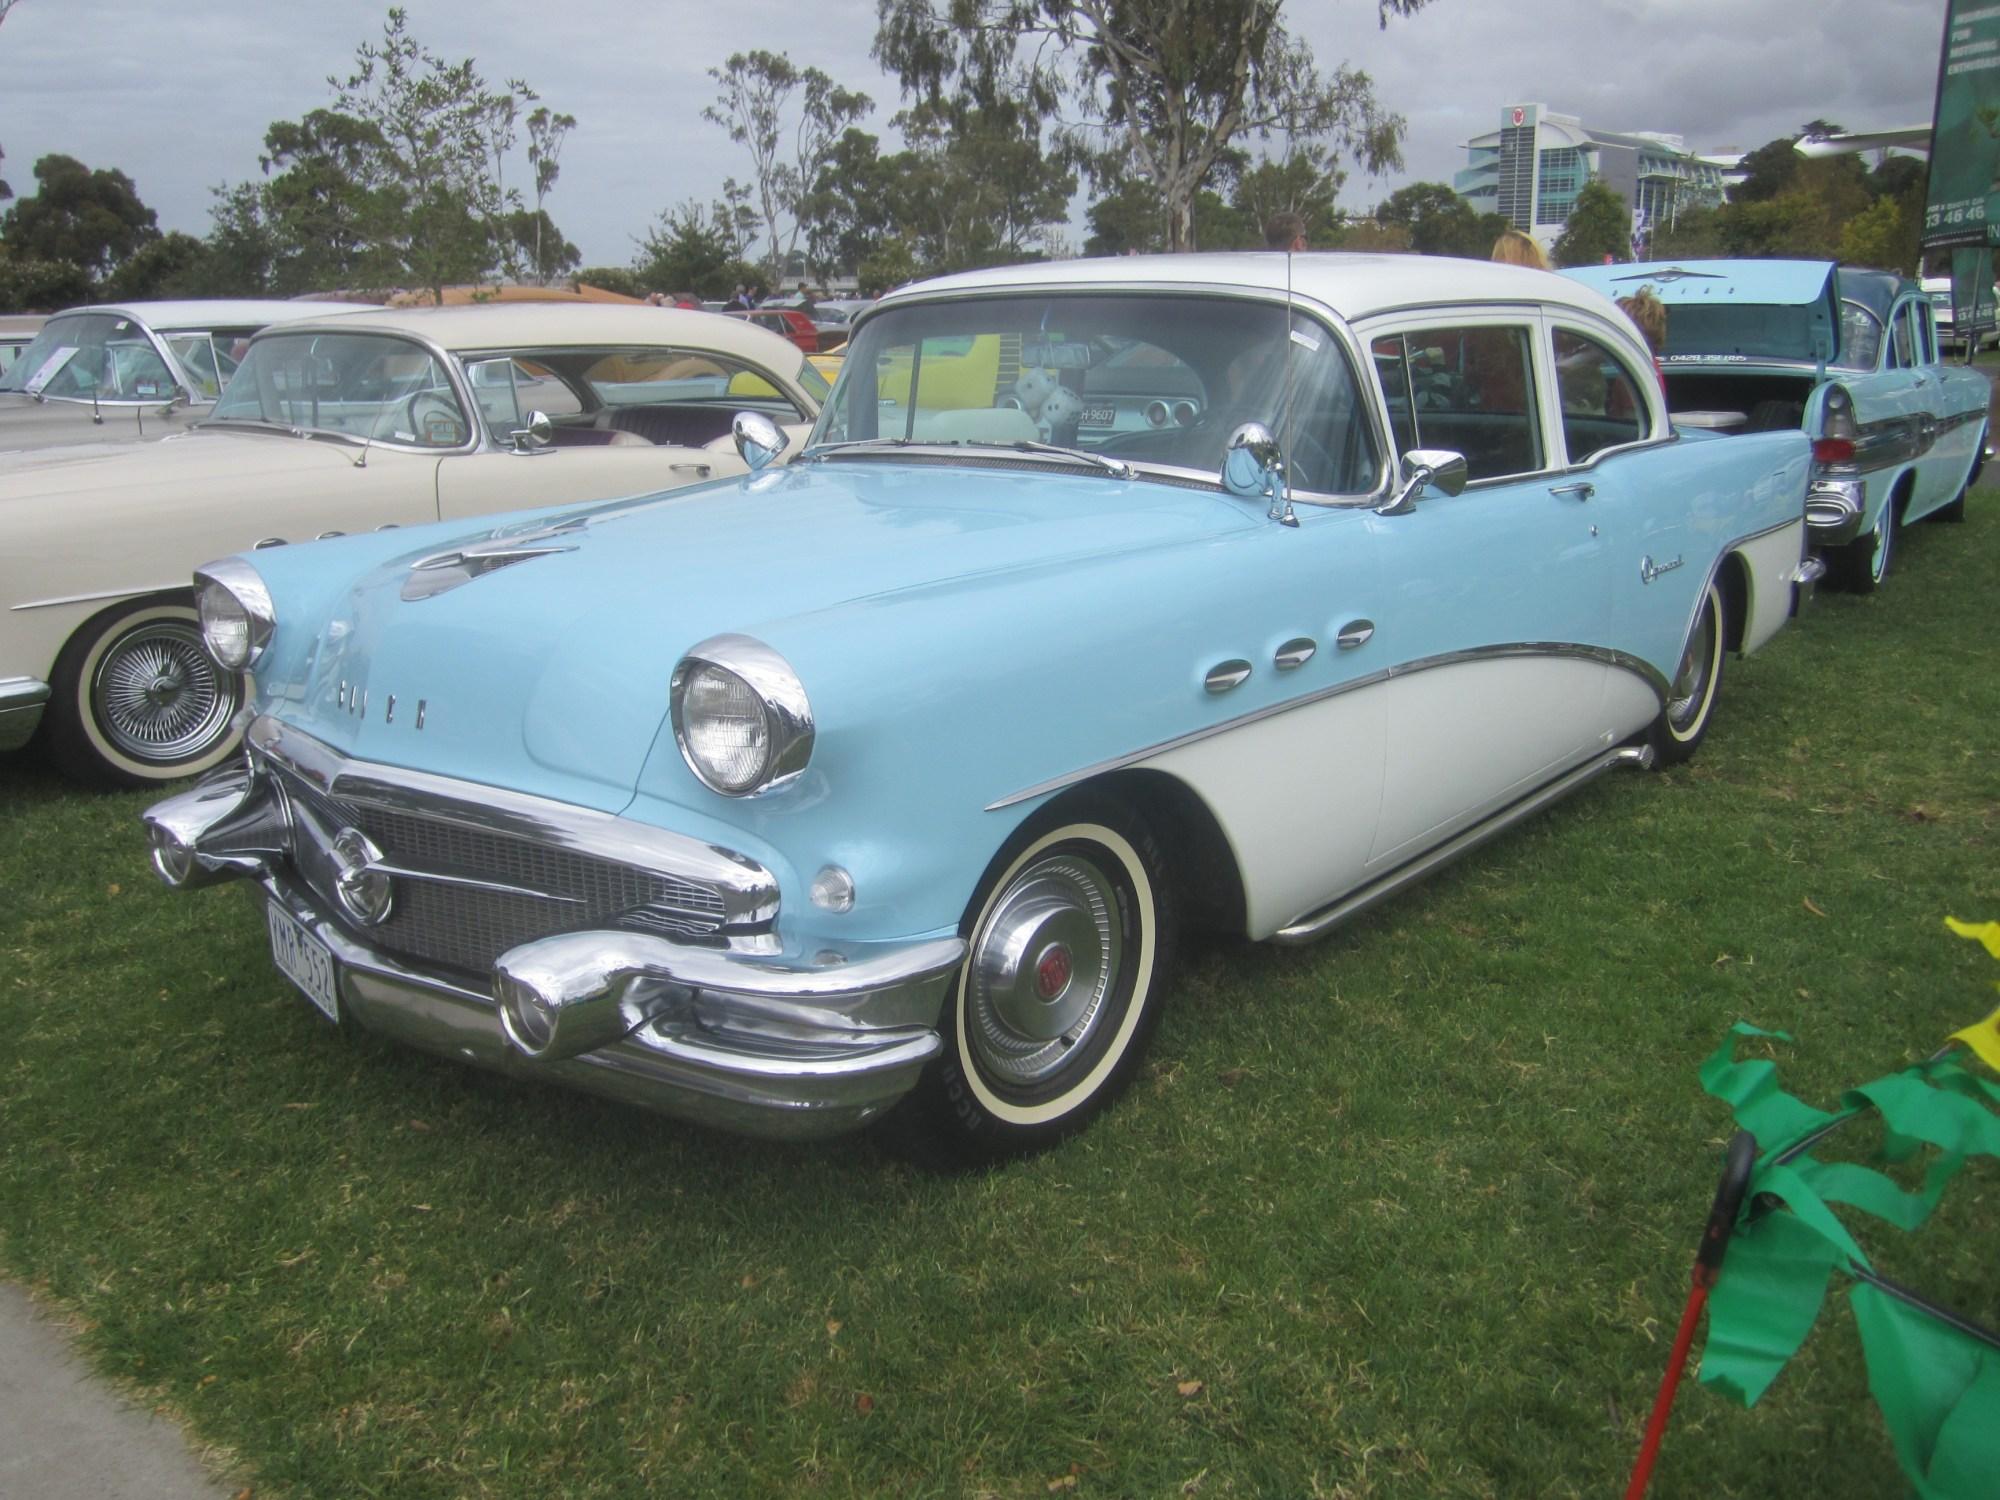 hight resolution of file 1956 buick series 40 special 2 dr sedan jpg